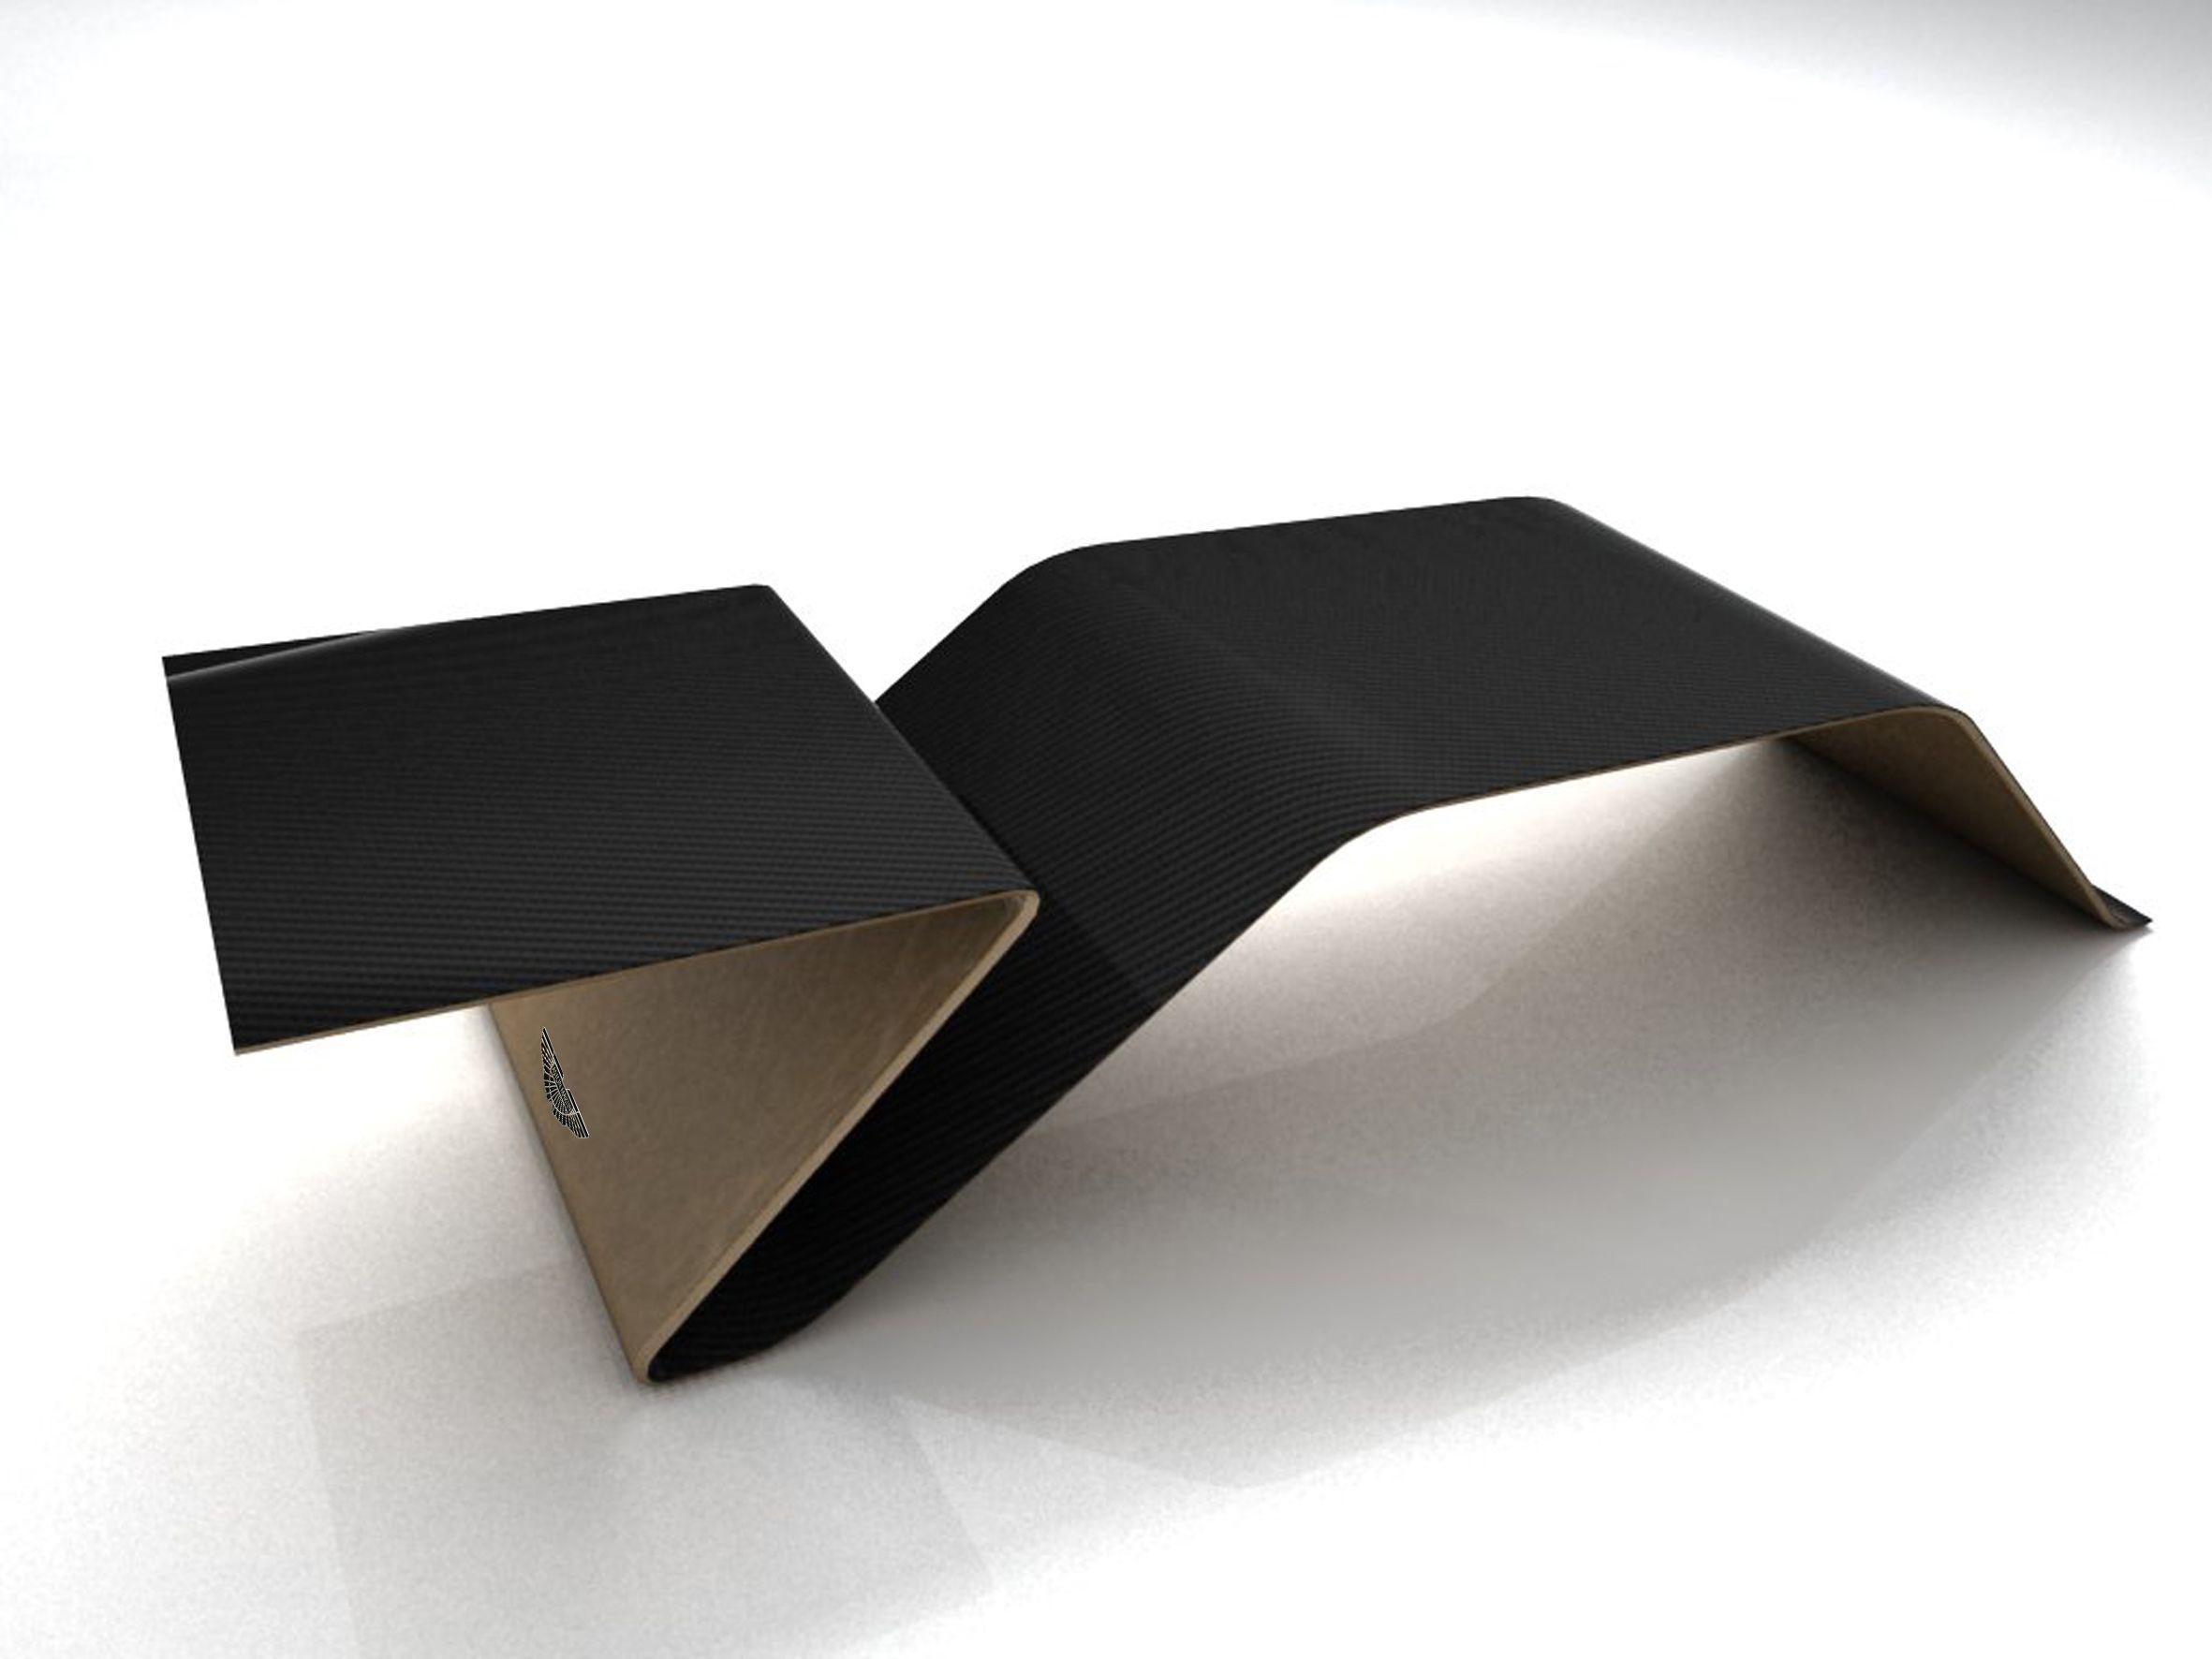 aston martin office furniture collection | design diseño light